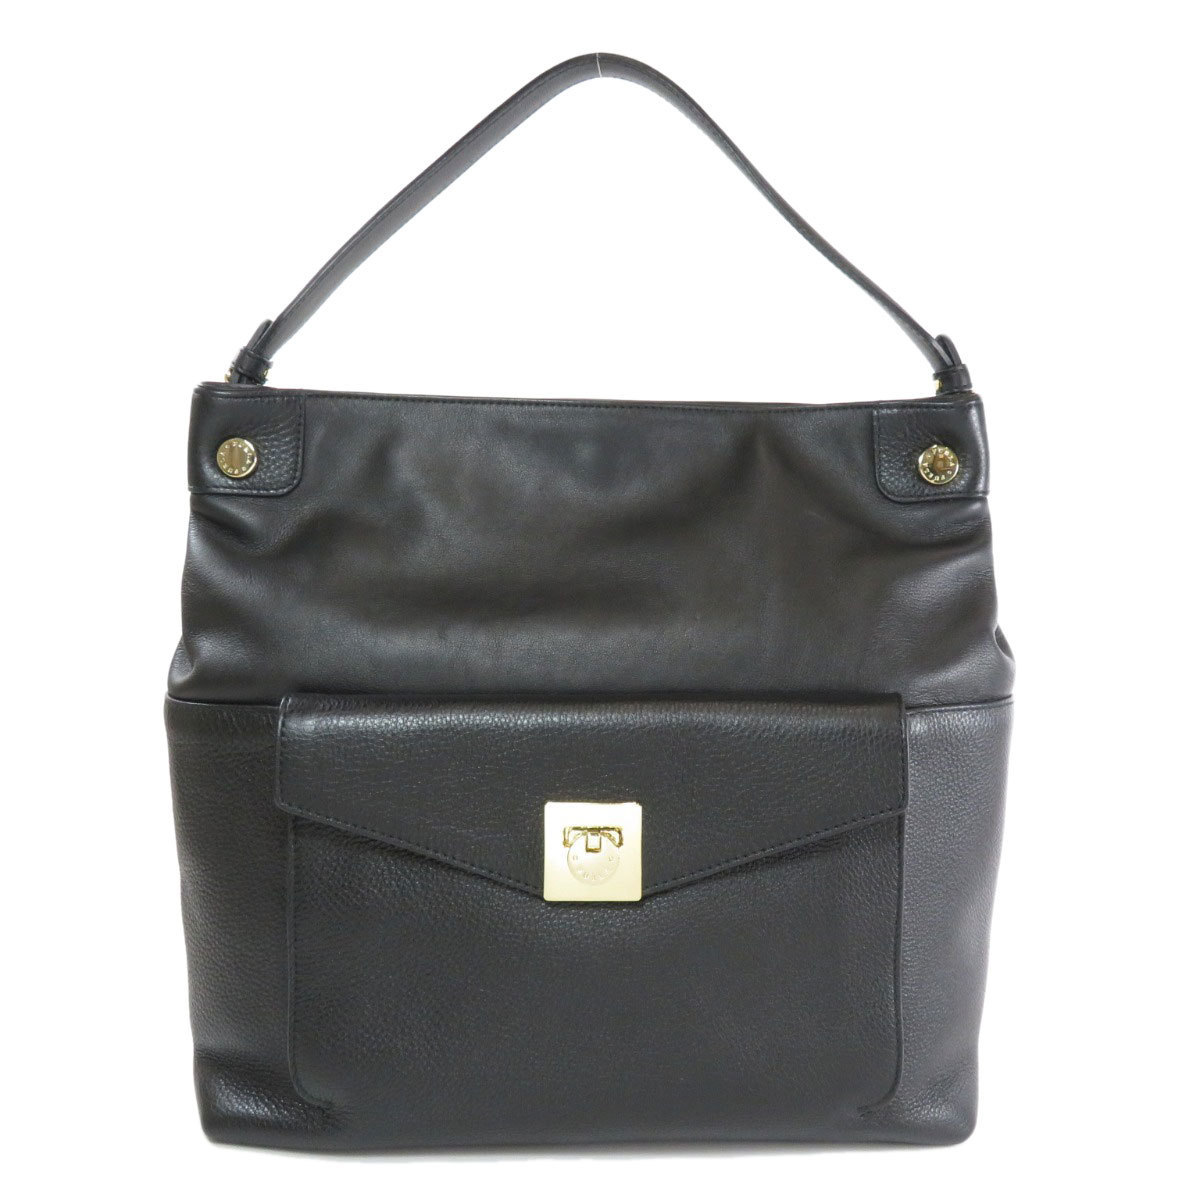 Furla logo metal fittings shoulder bag leather ladies